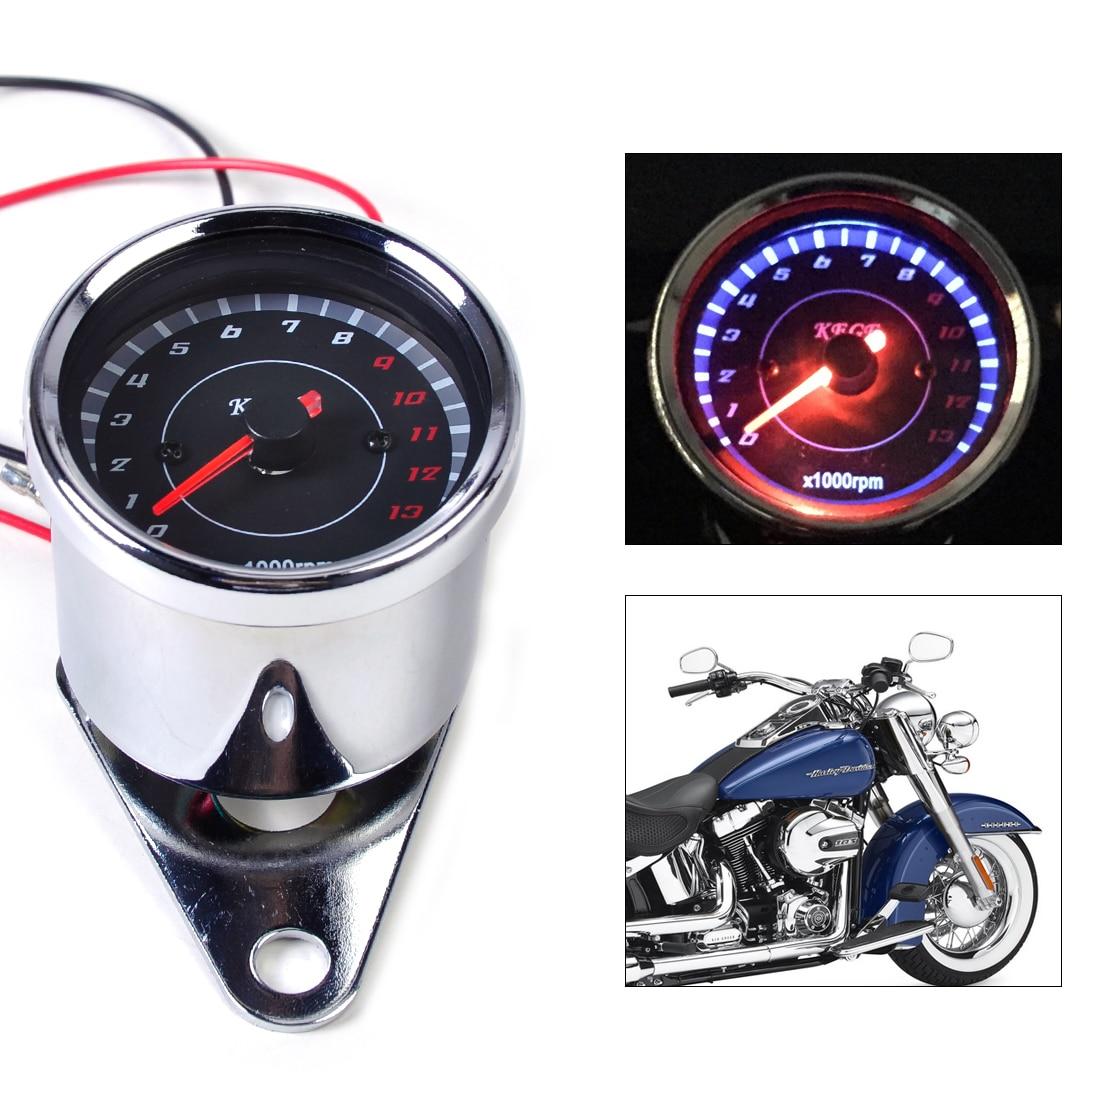 beler 60mm LED 13000 RPM Tachometer fit for Scooter Analog